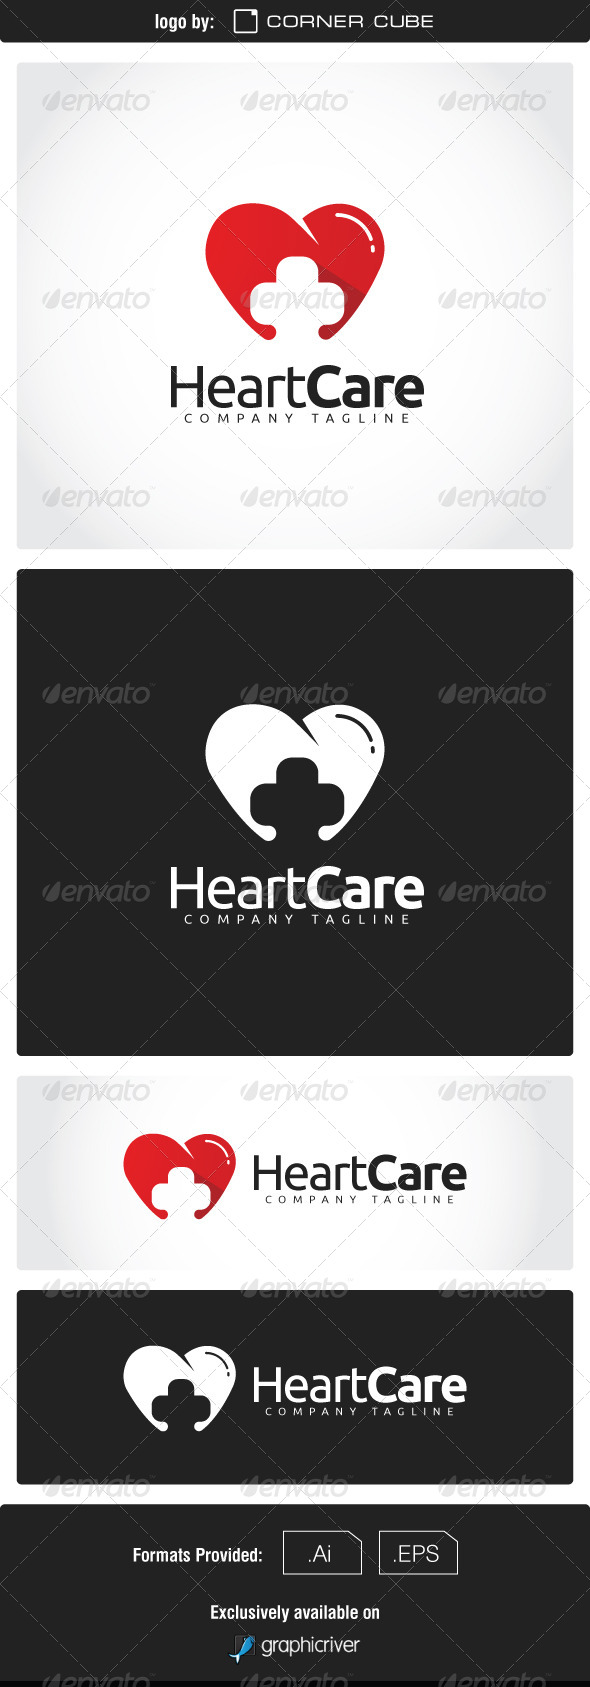 GraphicRiver Heart Care Logo 7463958